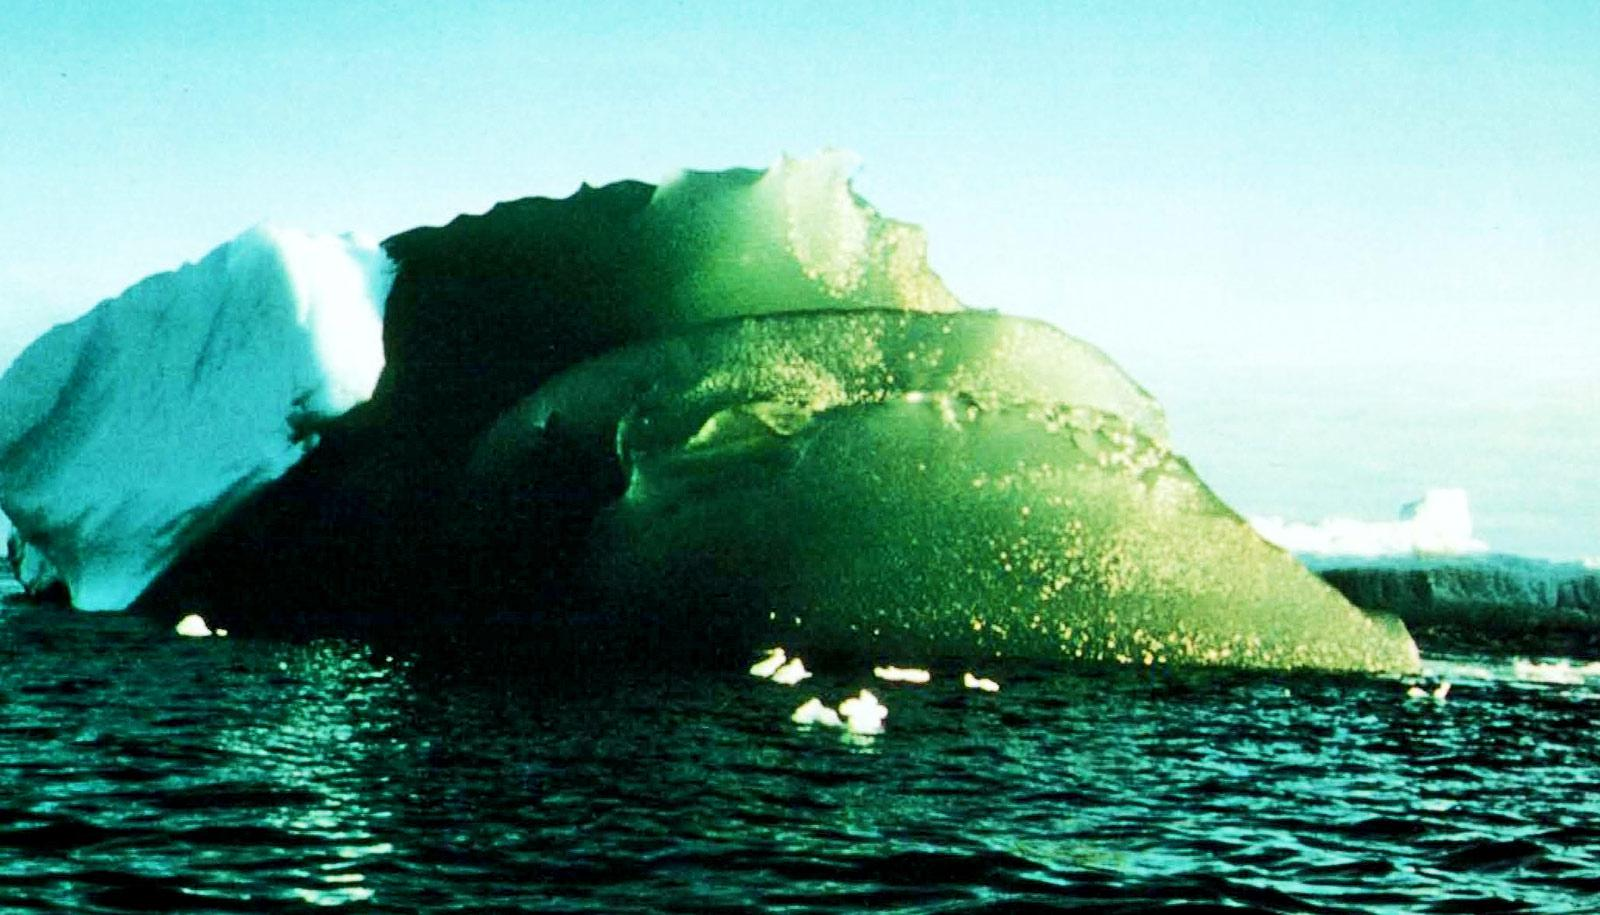 green iceberg